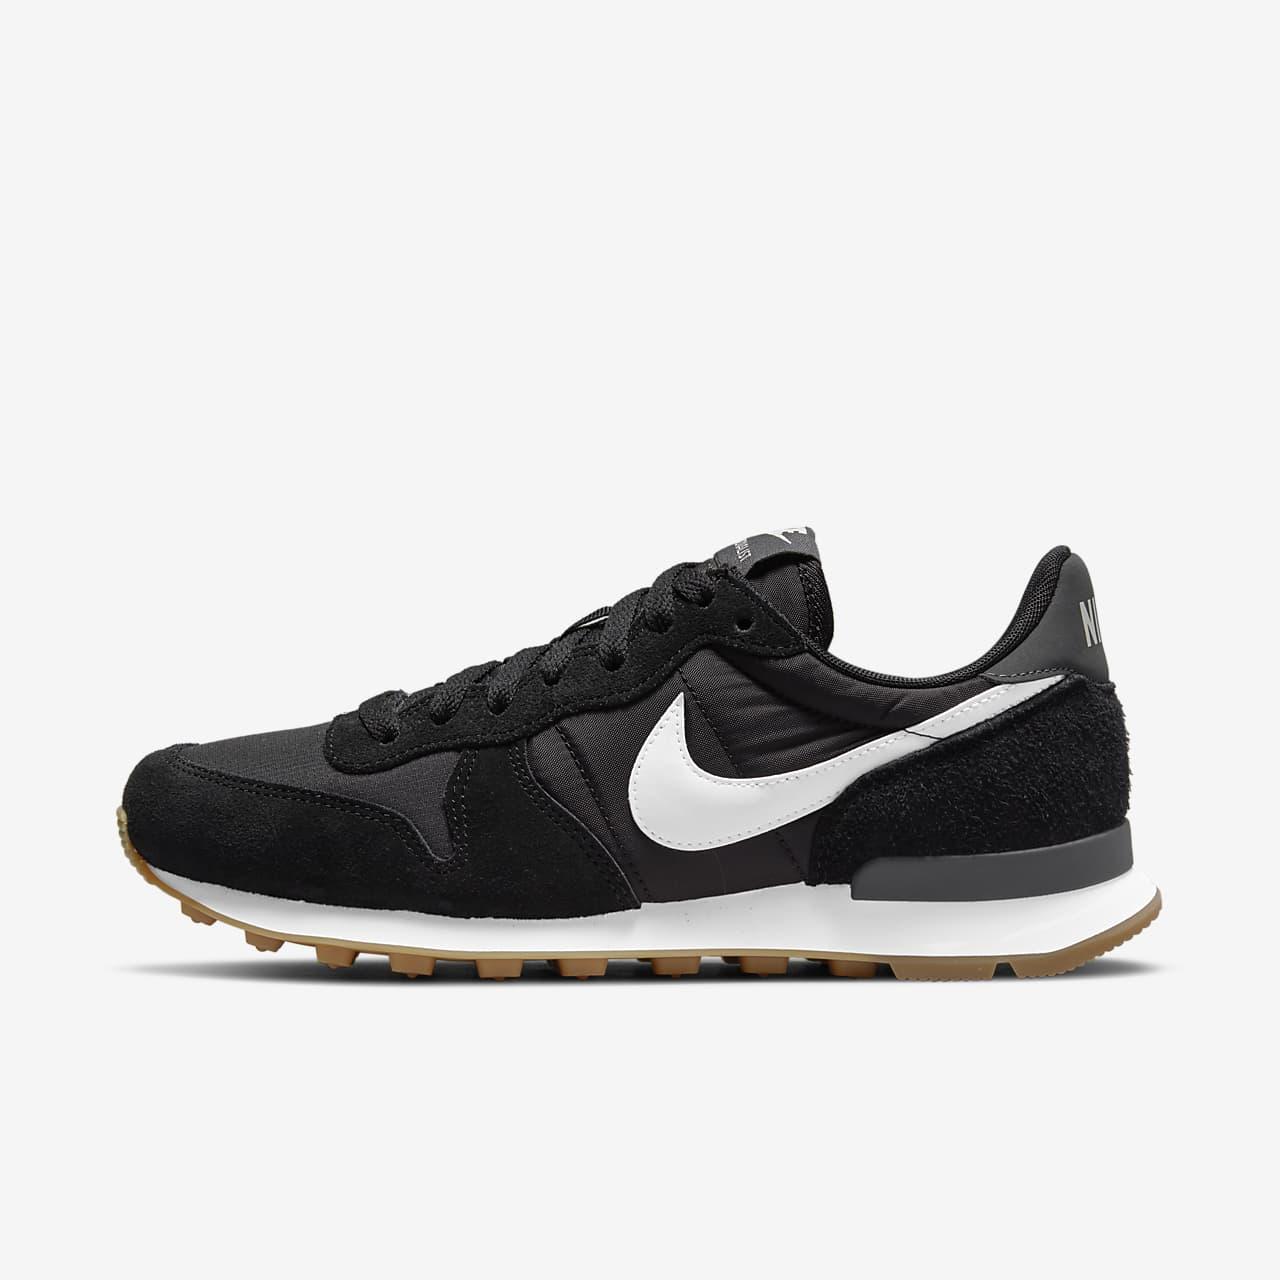 Nike Internationalist Damesschoen